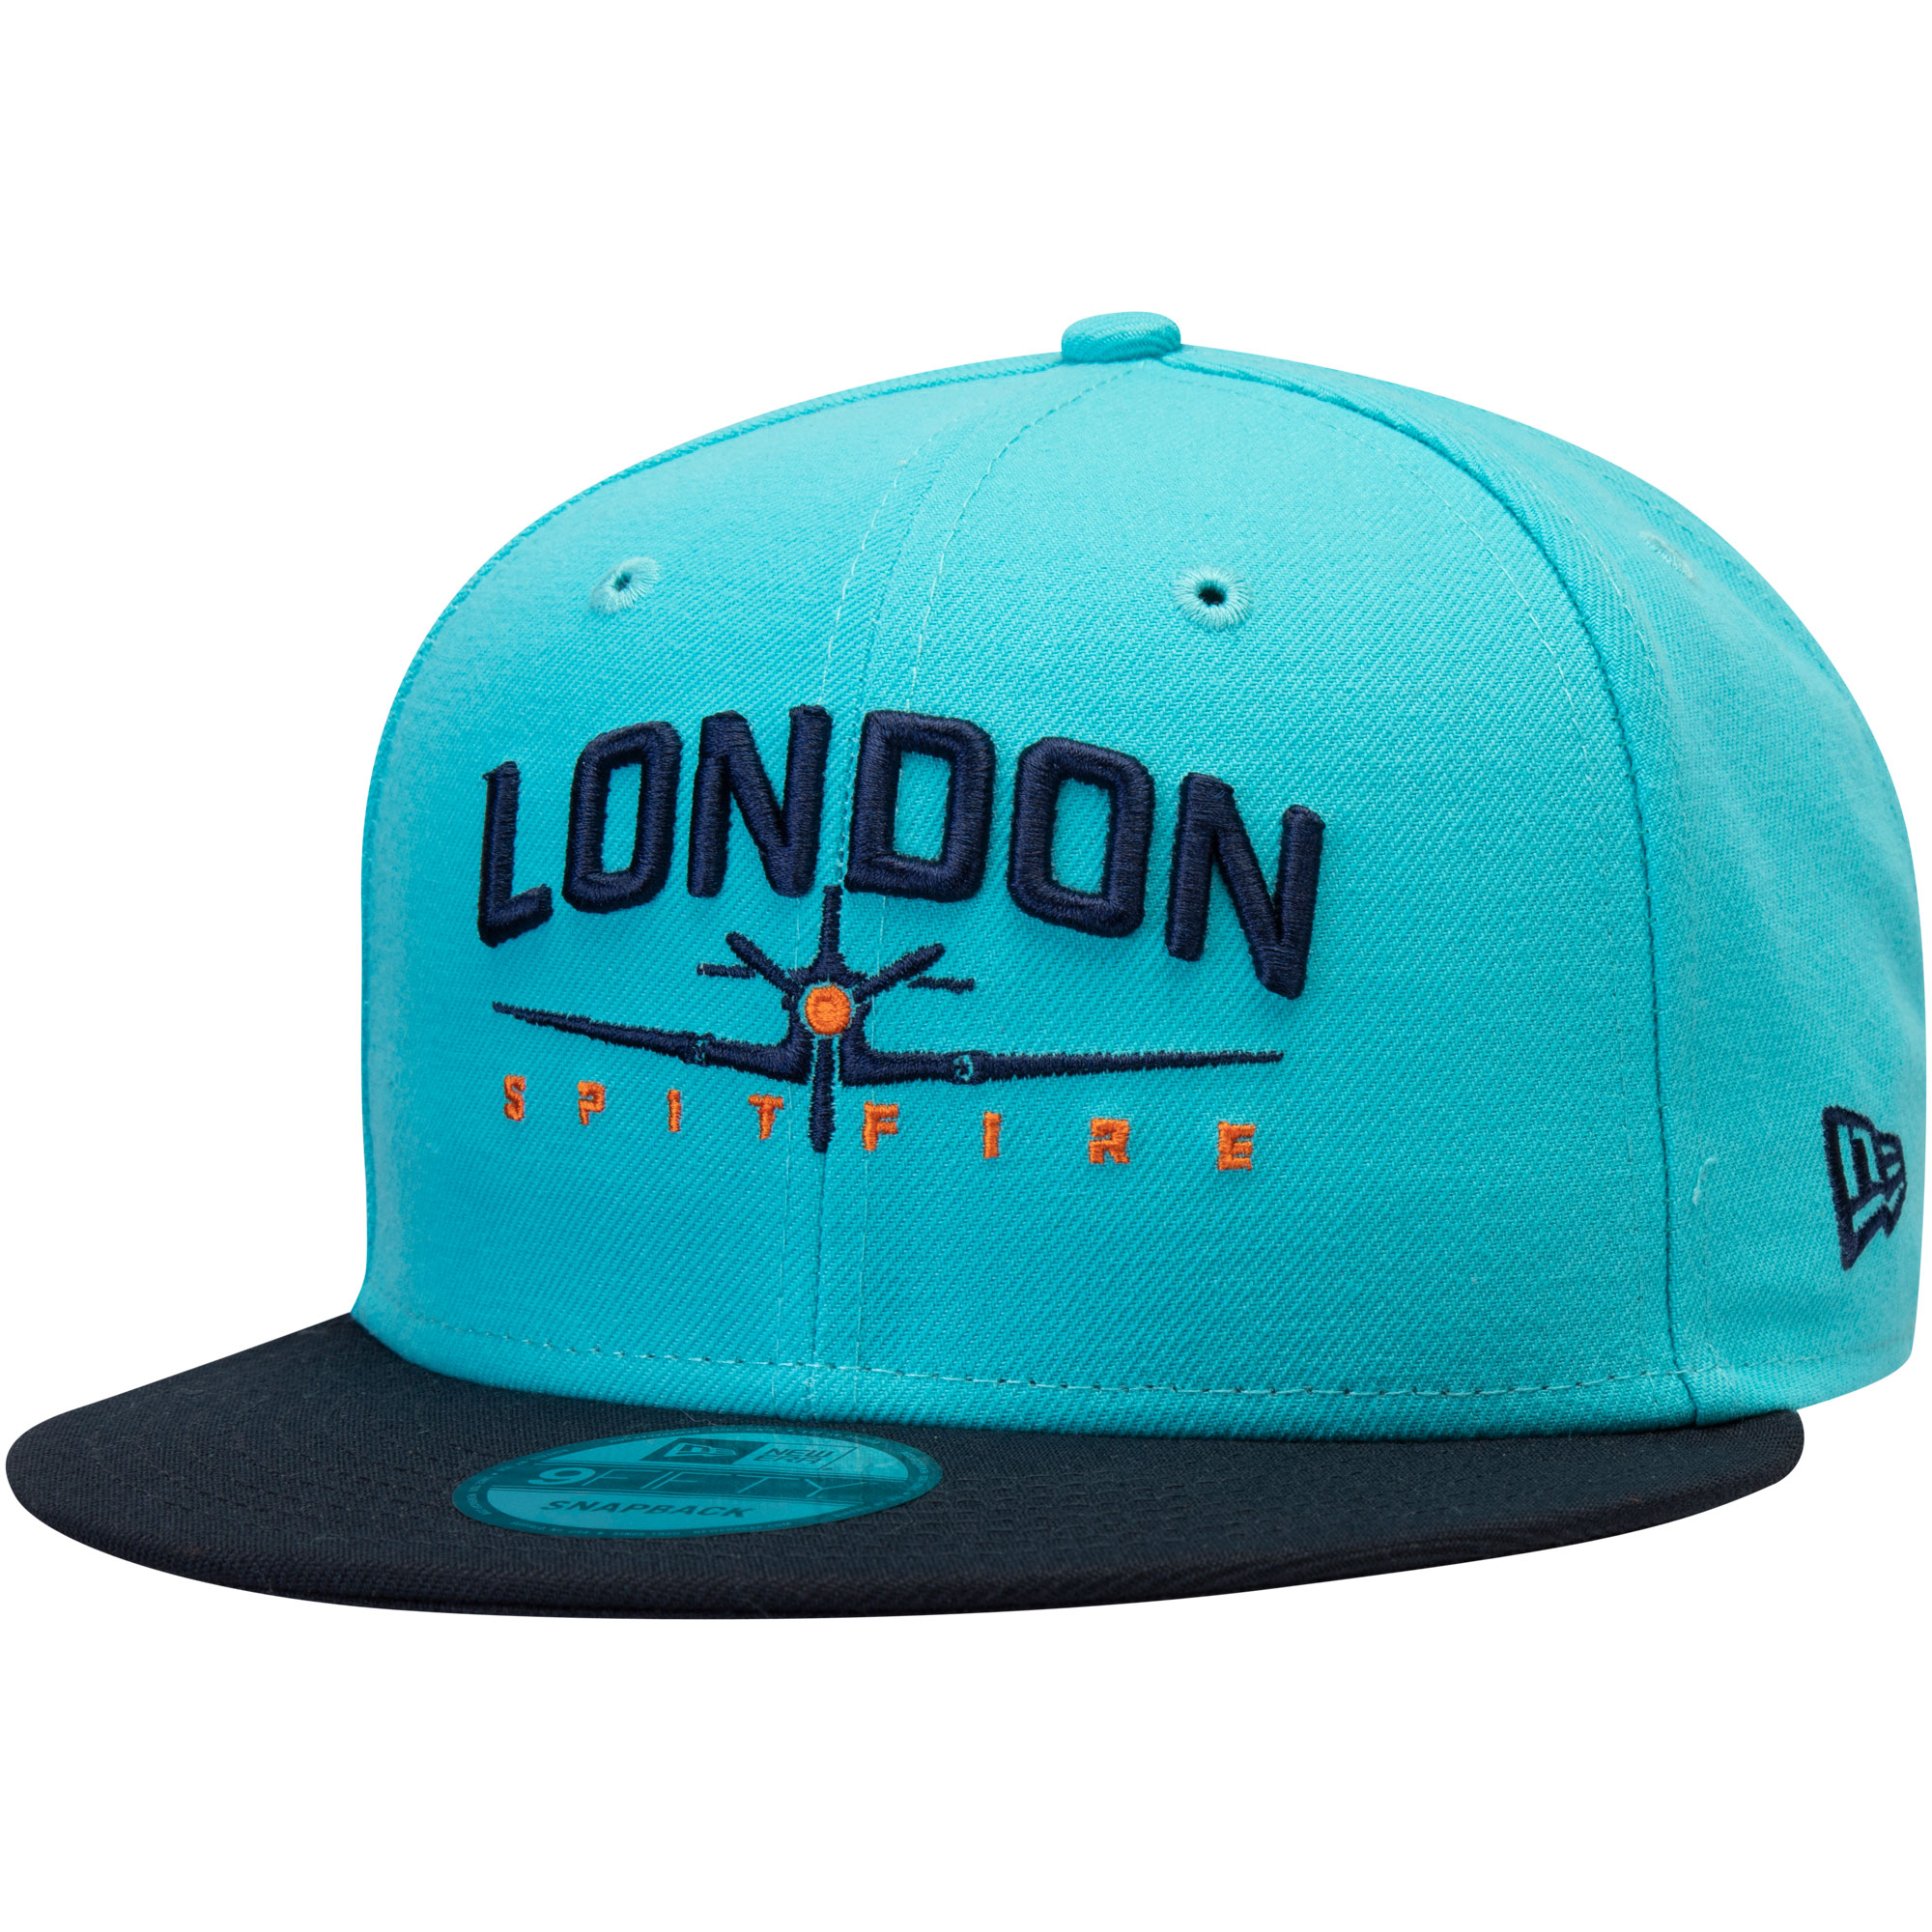 London Spitfire Overwatch League New Era Two-Tone Team Snapback Adjustable Hat - Light Blue - OSFA